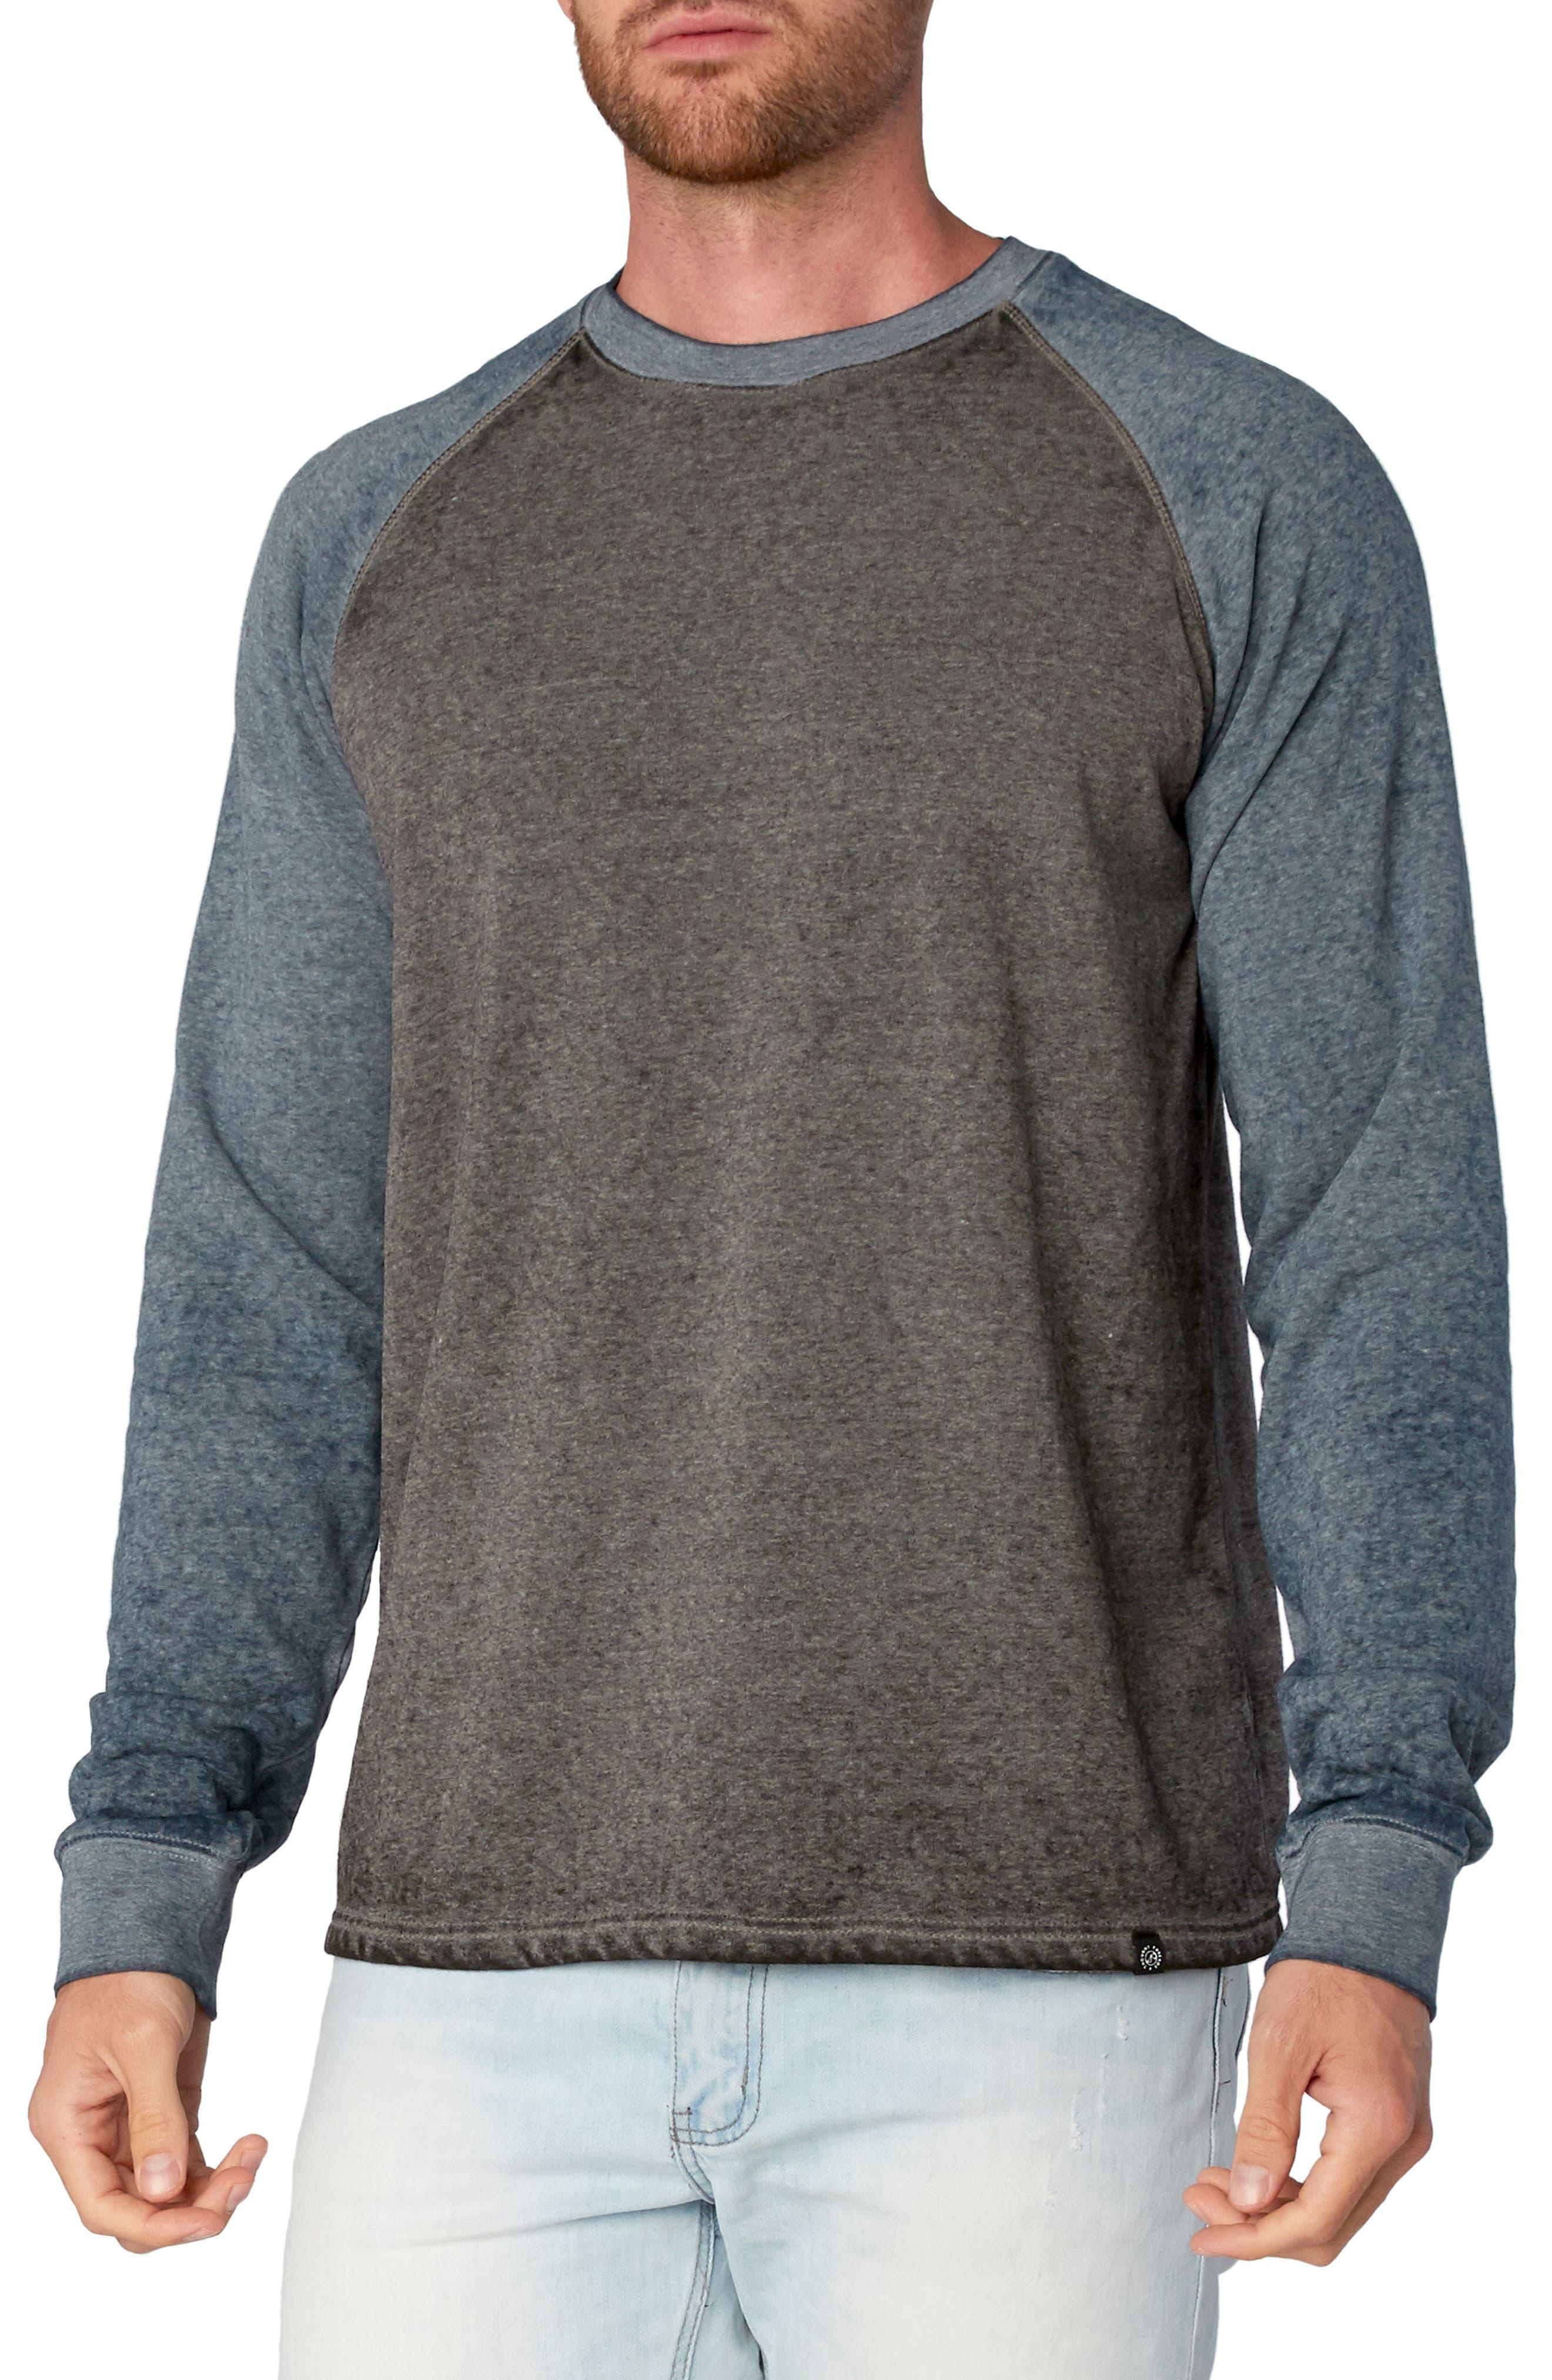 Washed Raglan Sleeve Sweatshirt,                             Main thumbnail 1, color,                             Black/ Raw Denim